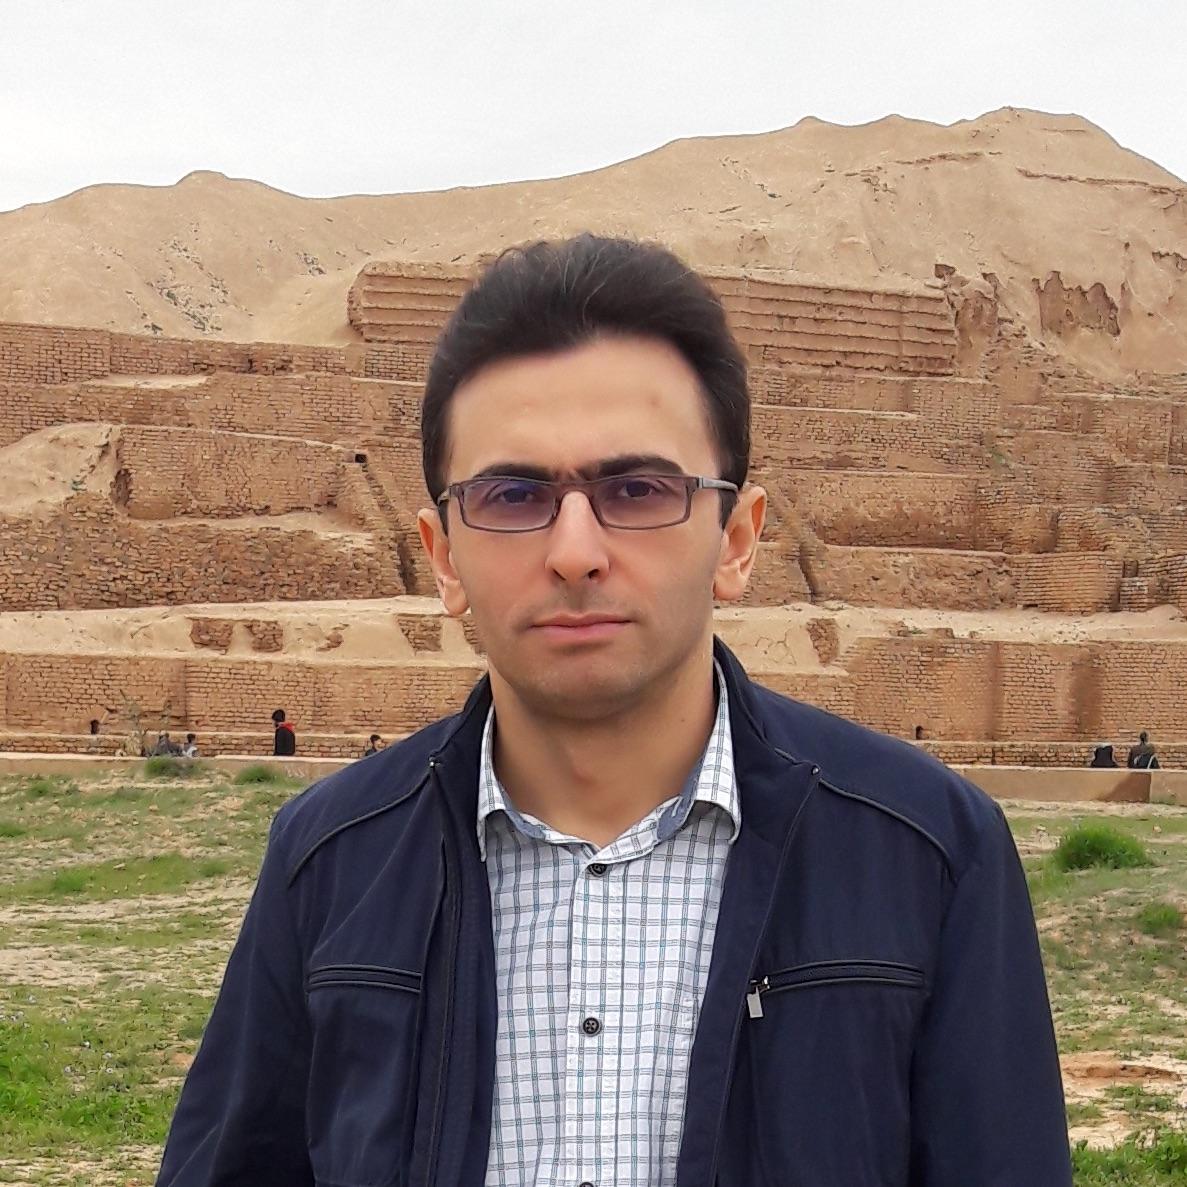 Saeed Abedinpour